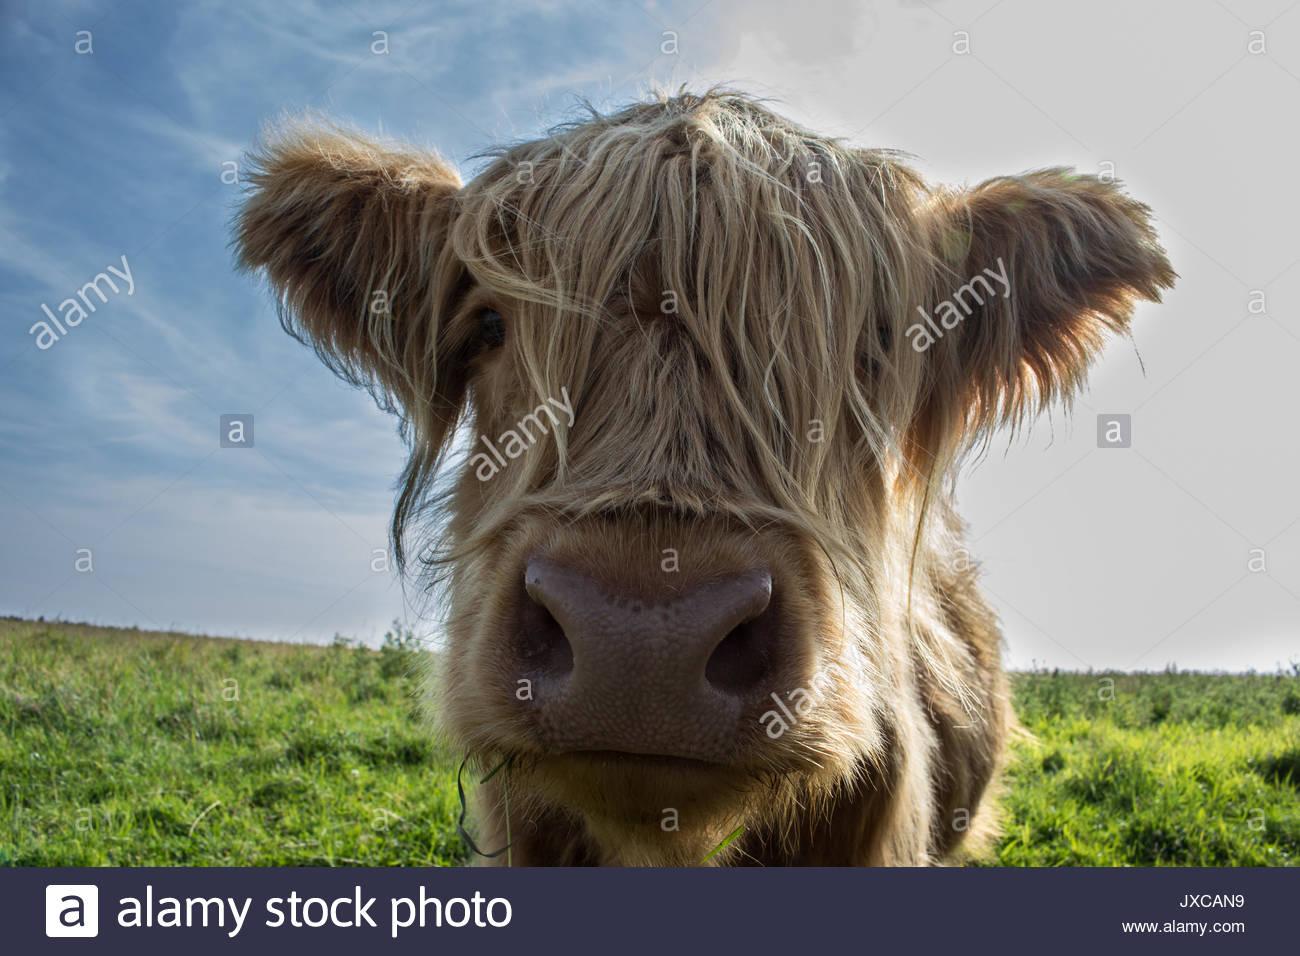 Cow Looking at Camera - Stock Image